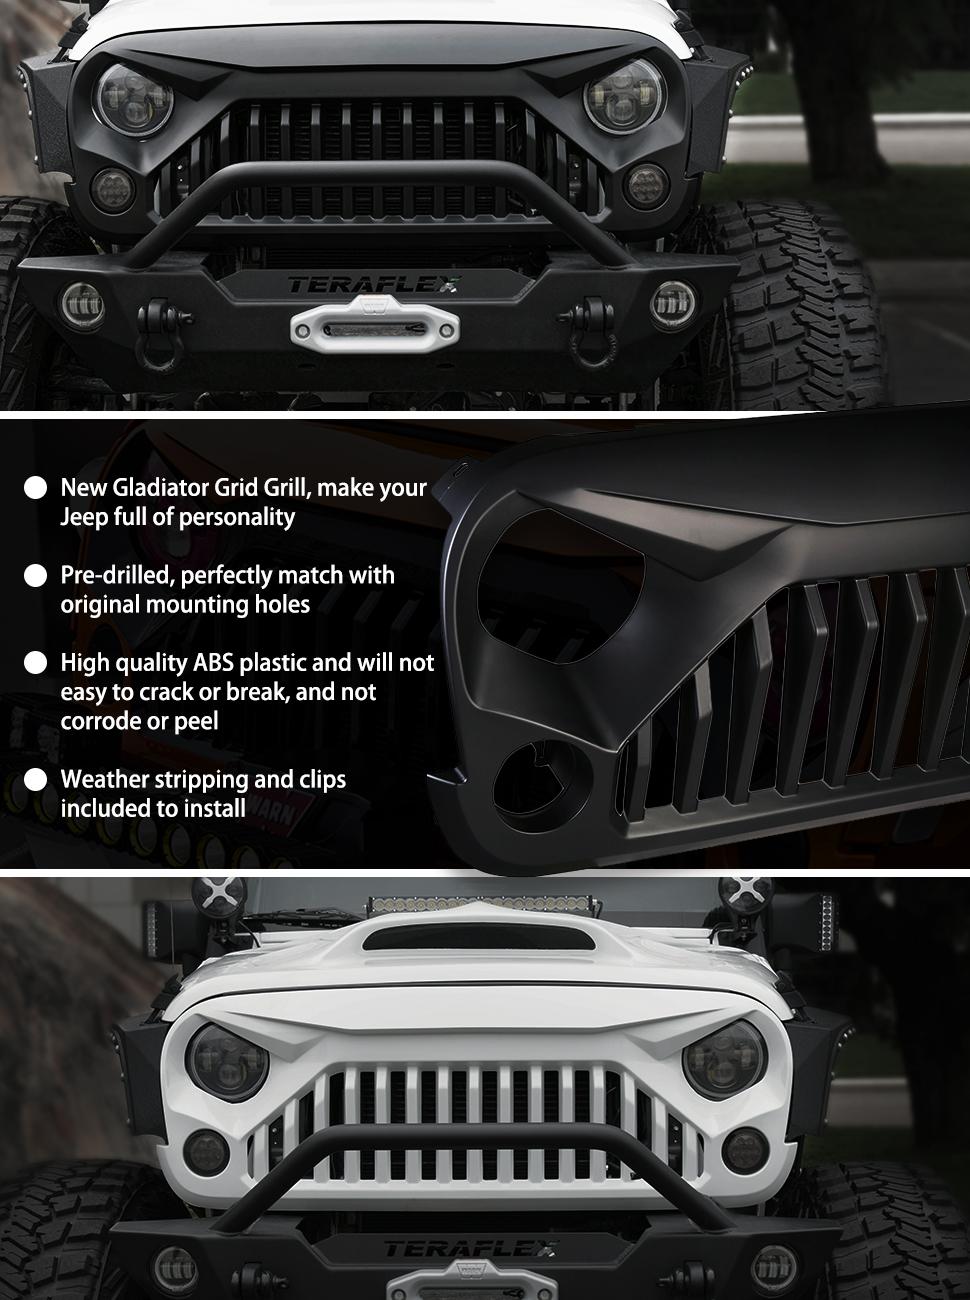 2016 Jeep Gladiator >> Amazon.com: Xprite Gladiator Vader Front Matte Black ...